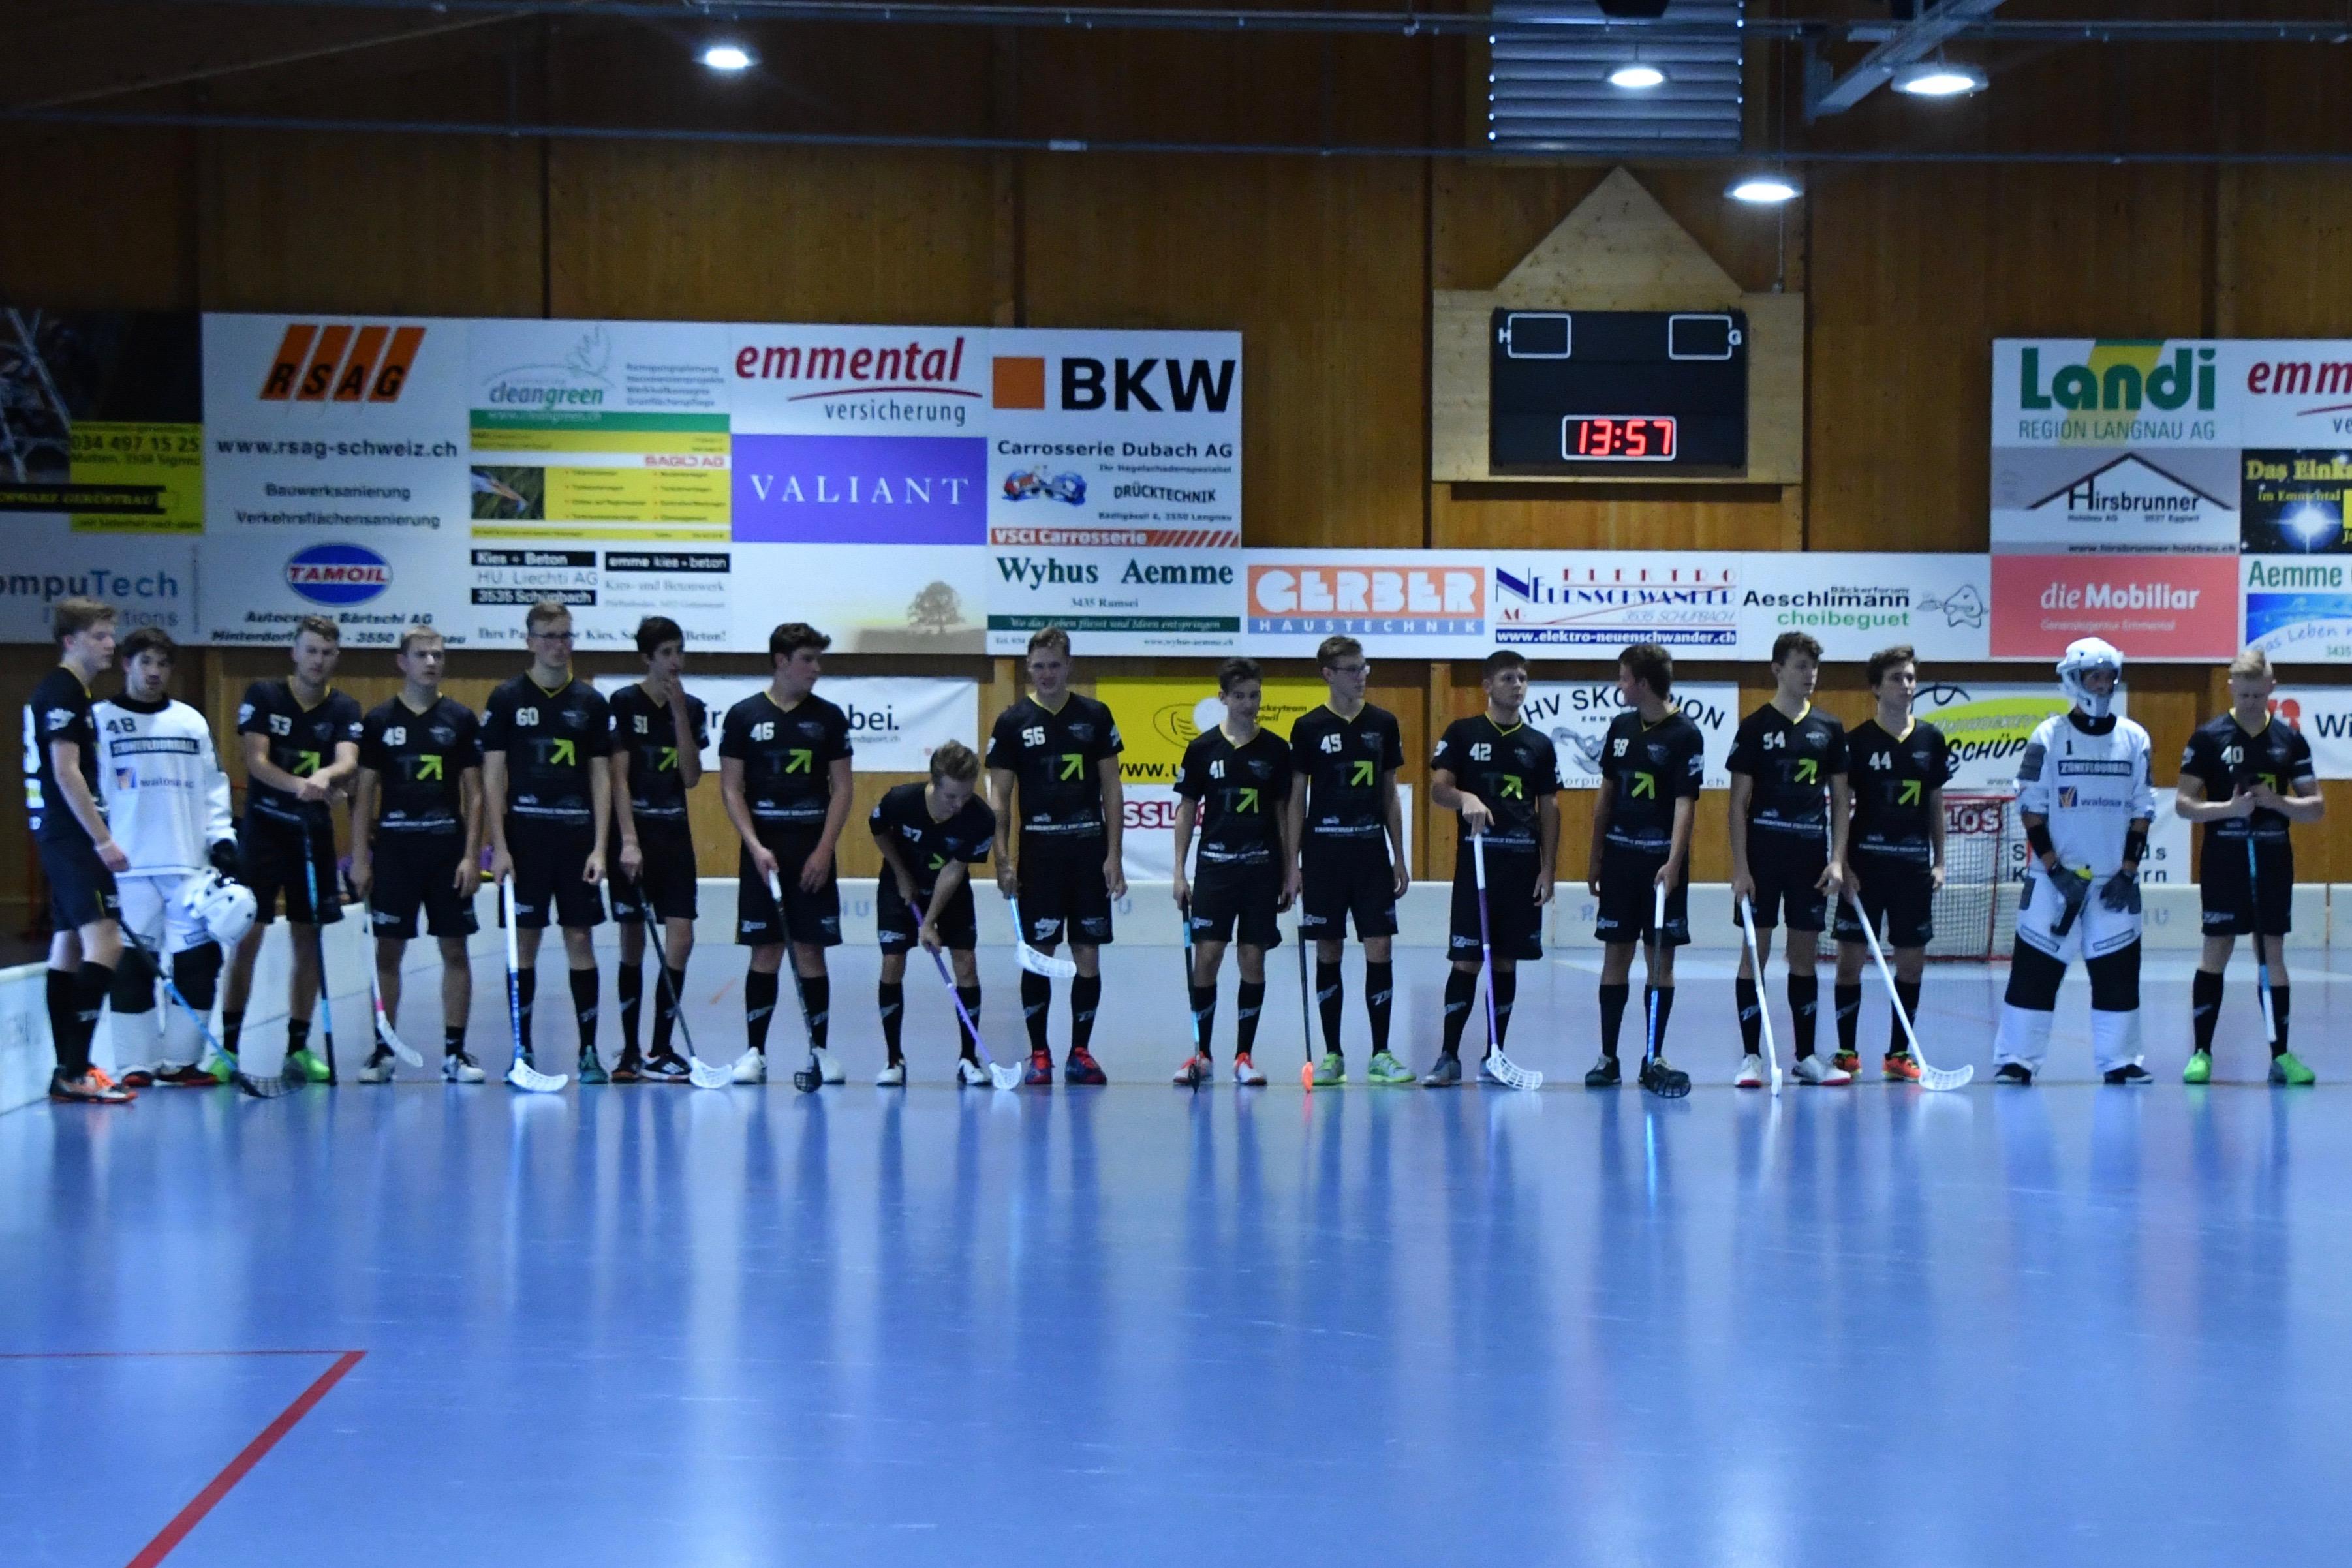 Junioren U21 - UHC Konolfingen Lions Saison 2018/19